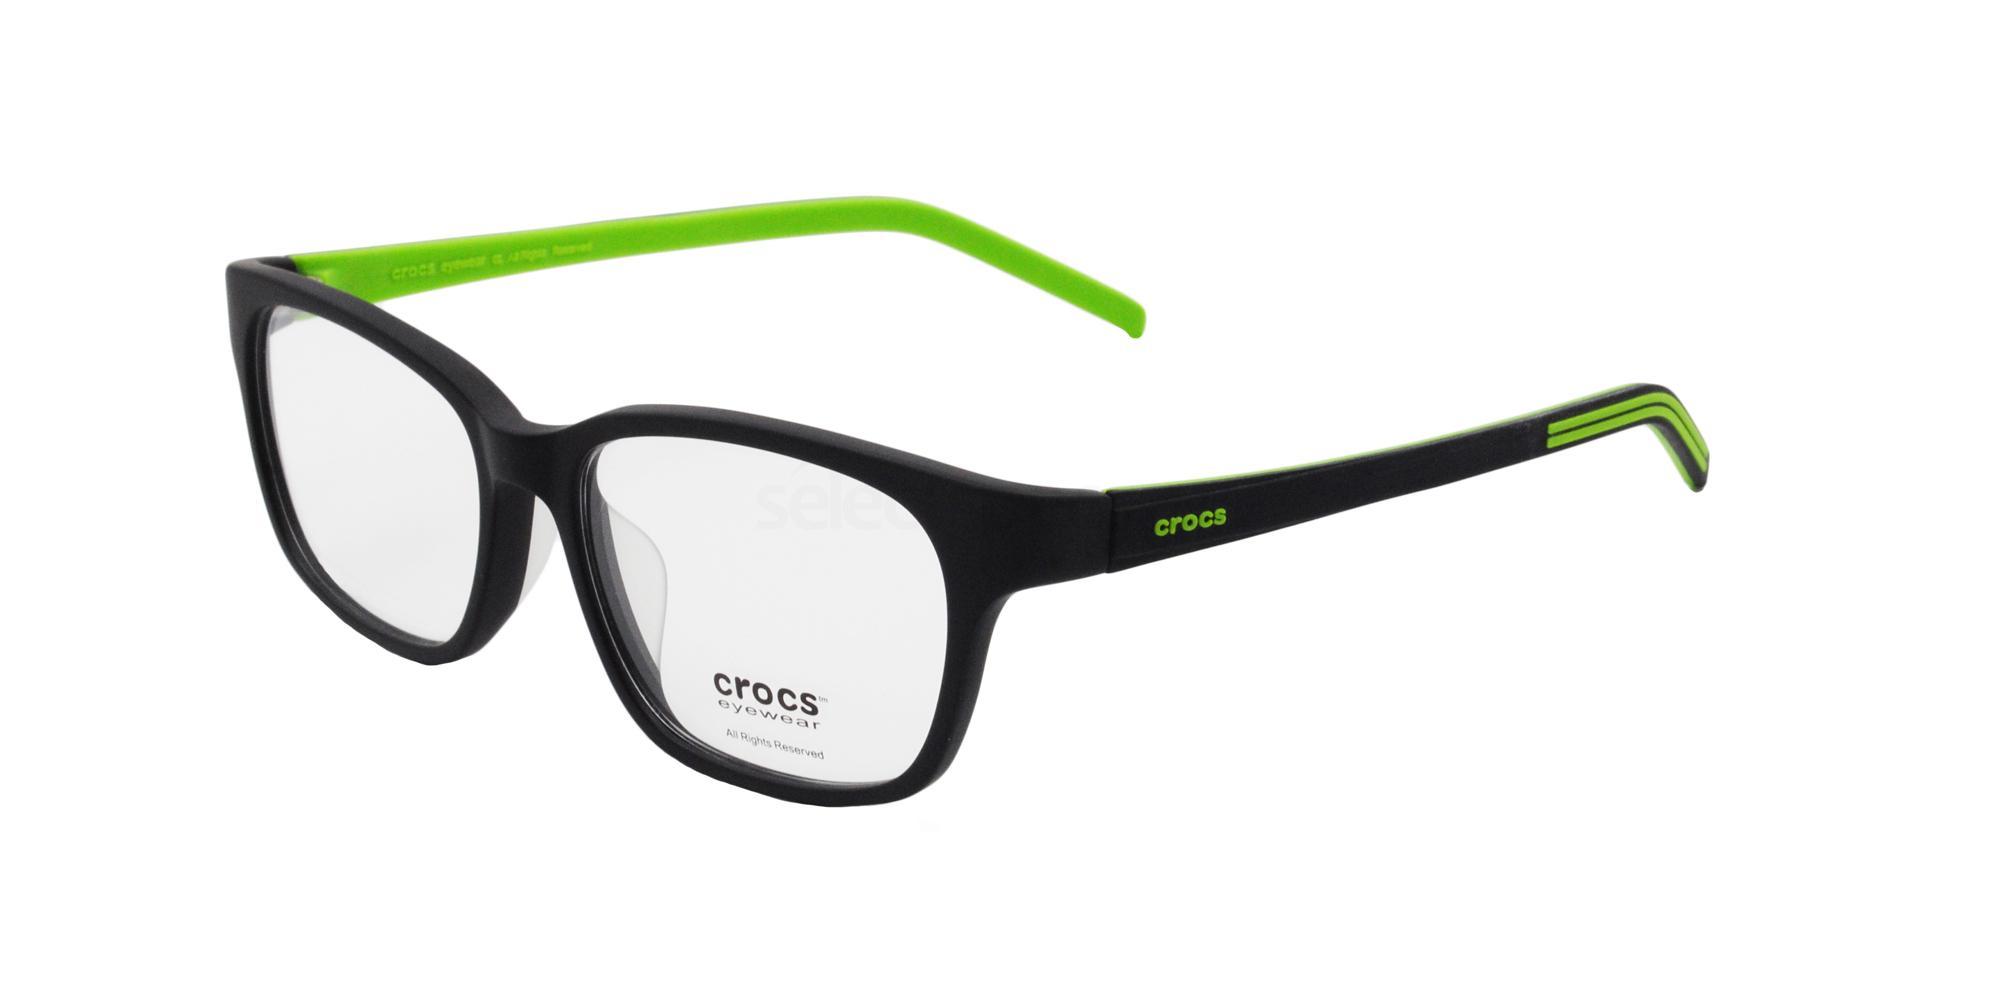 20GN CF 394 Glasses, Crocs Eyewear